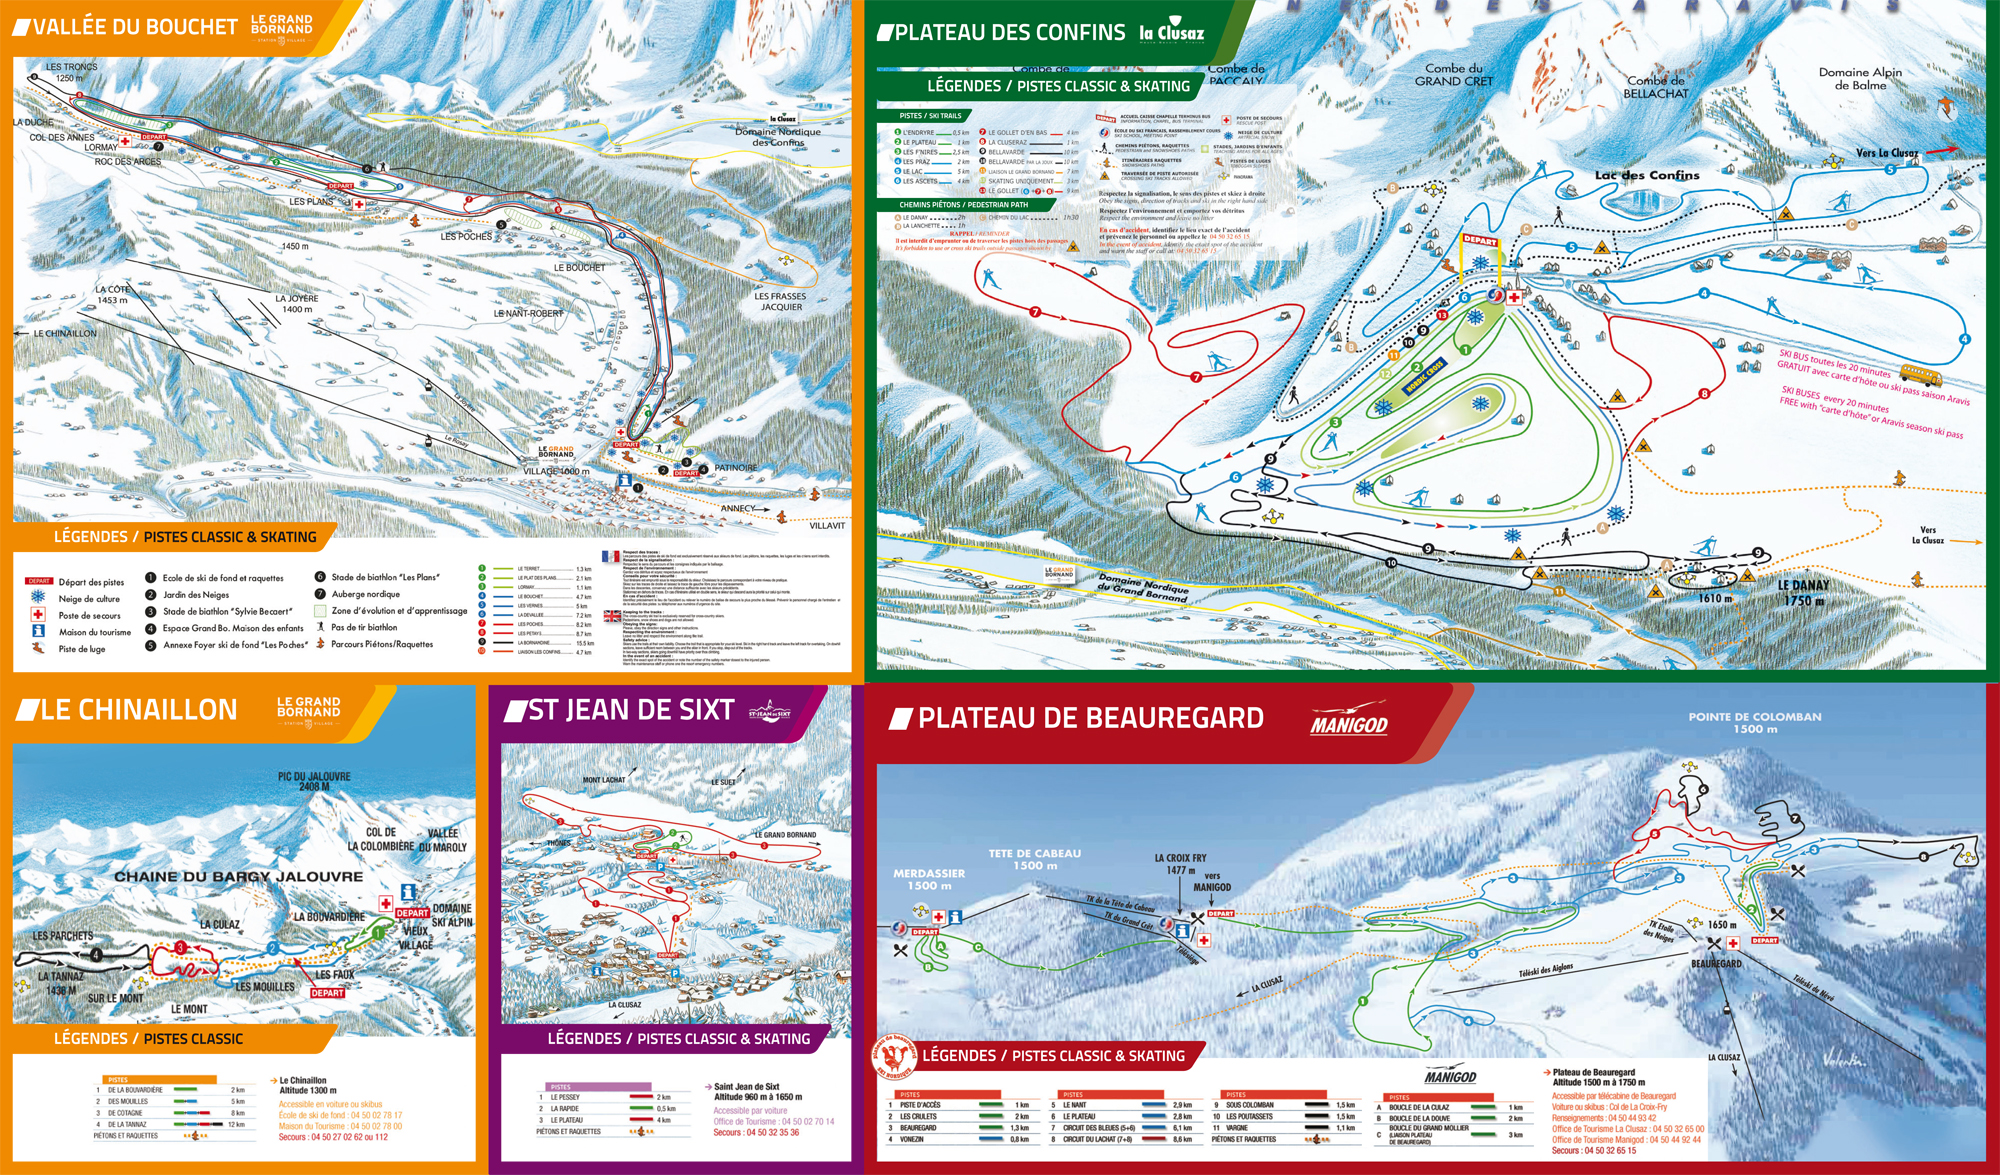 Domaine skiable le grand bornand station et pistes de ski - Office du tourisme grand bornand chinaillon ...